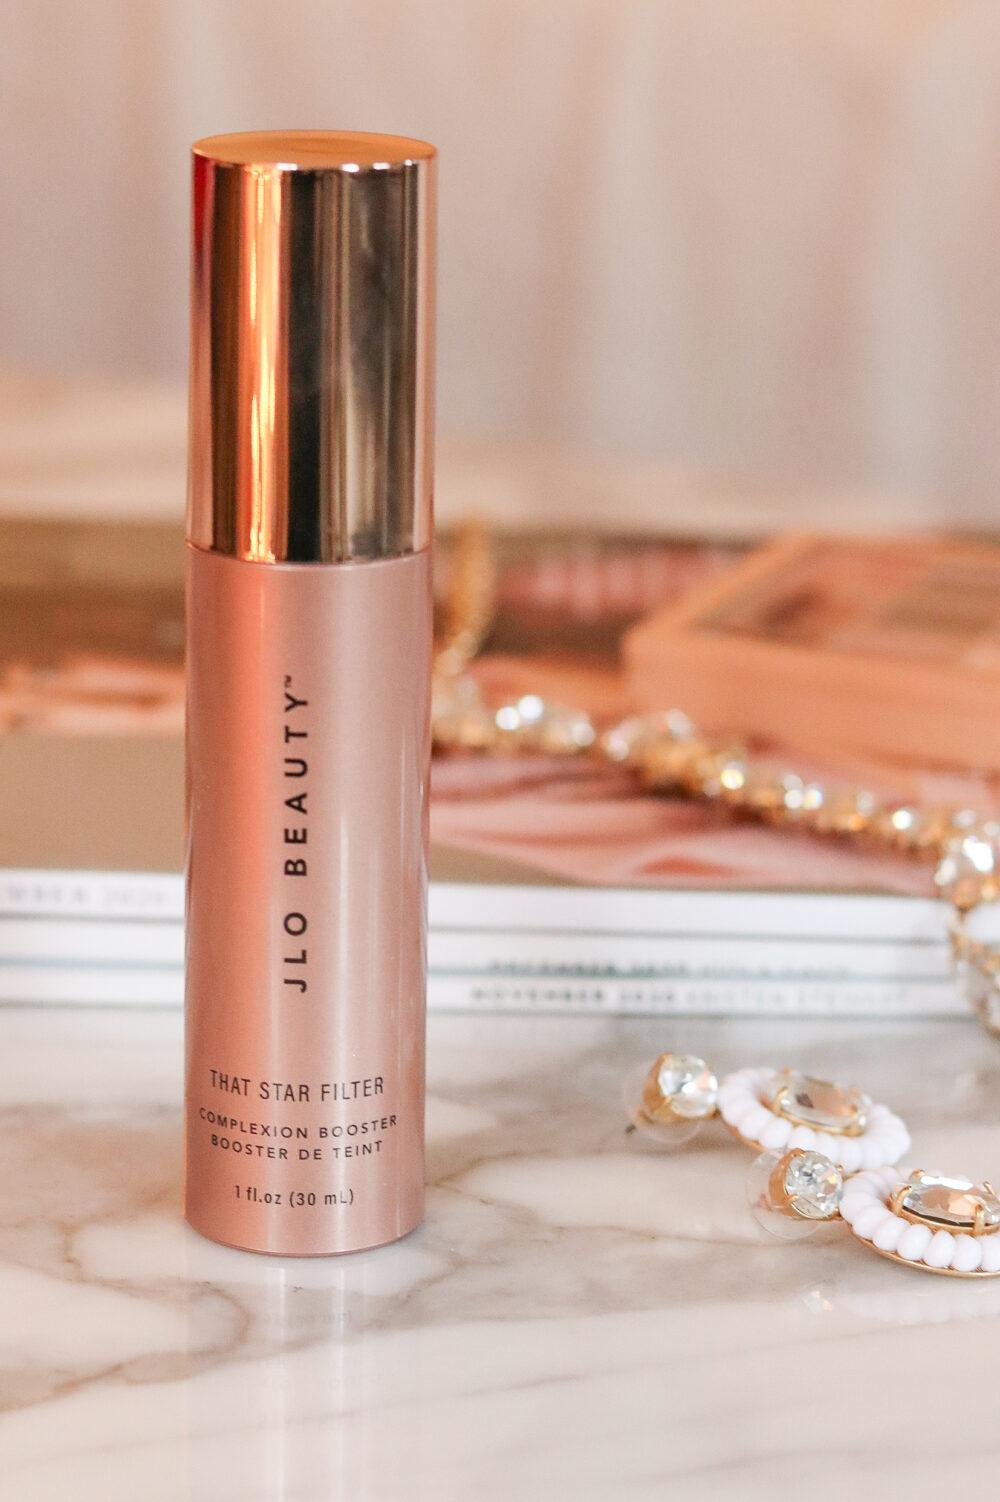 JLO Beauty Highlighting Complexion Review I DreaminLace.com #Makeup #Makeupblog #beautyblog #crueltyfreebeauty